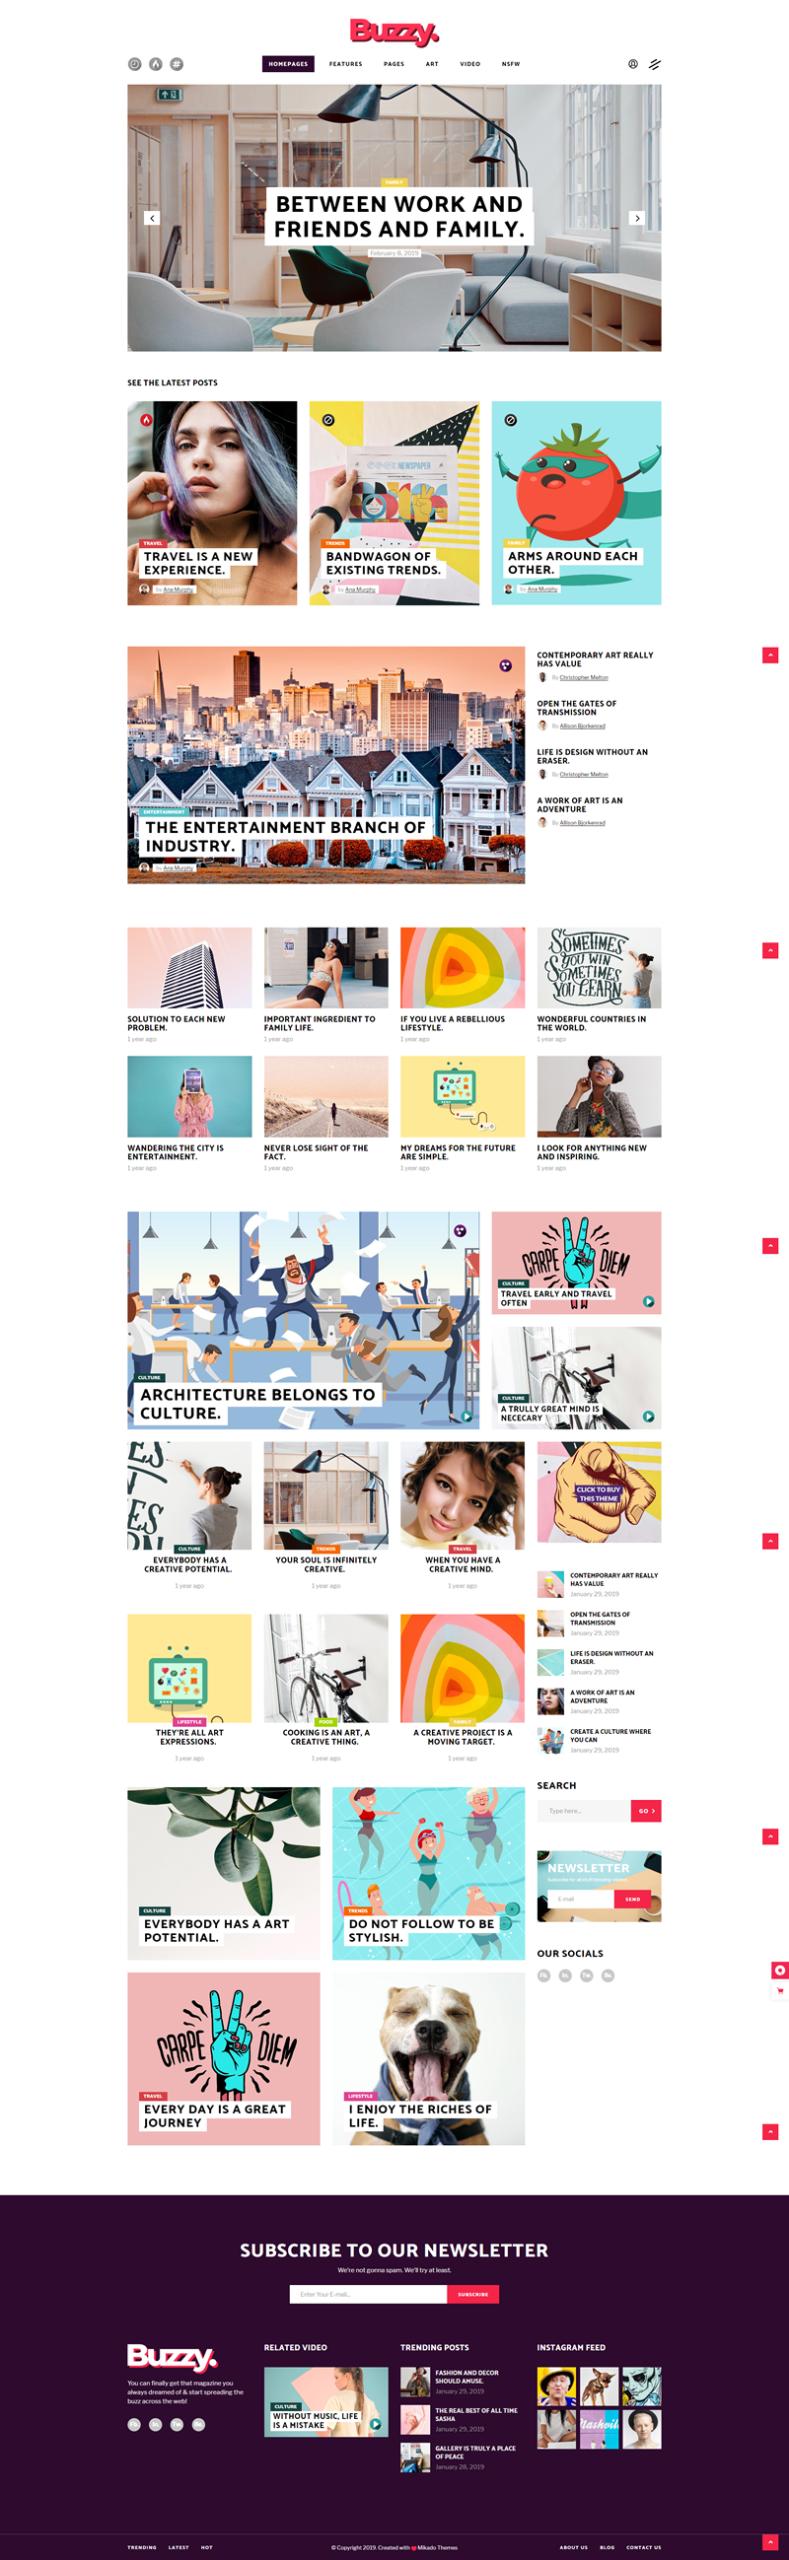 Buzzy - best WordPress themes for magazine or news websites